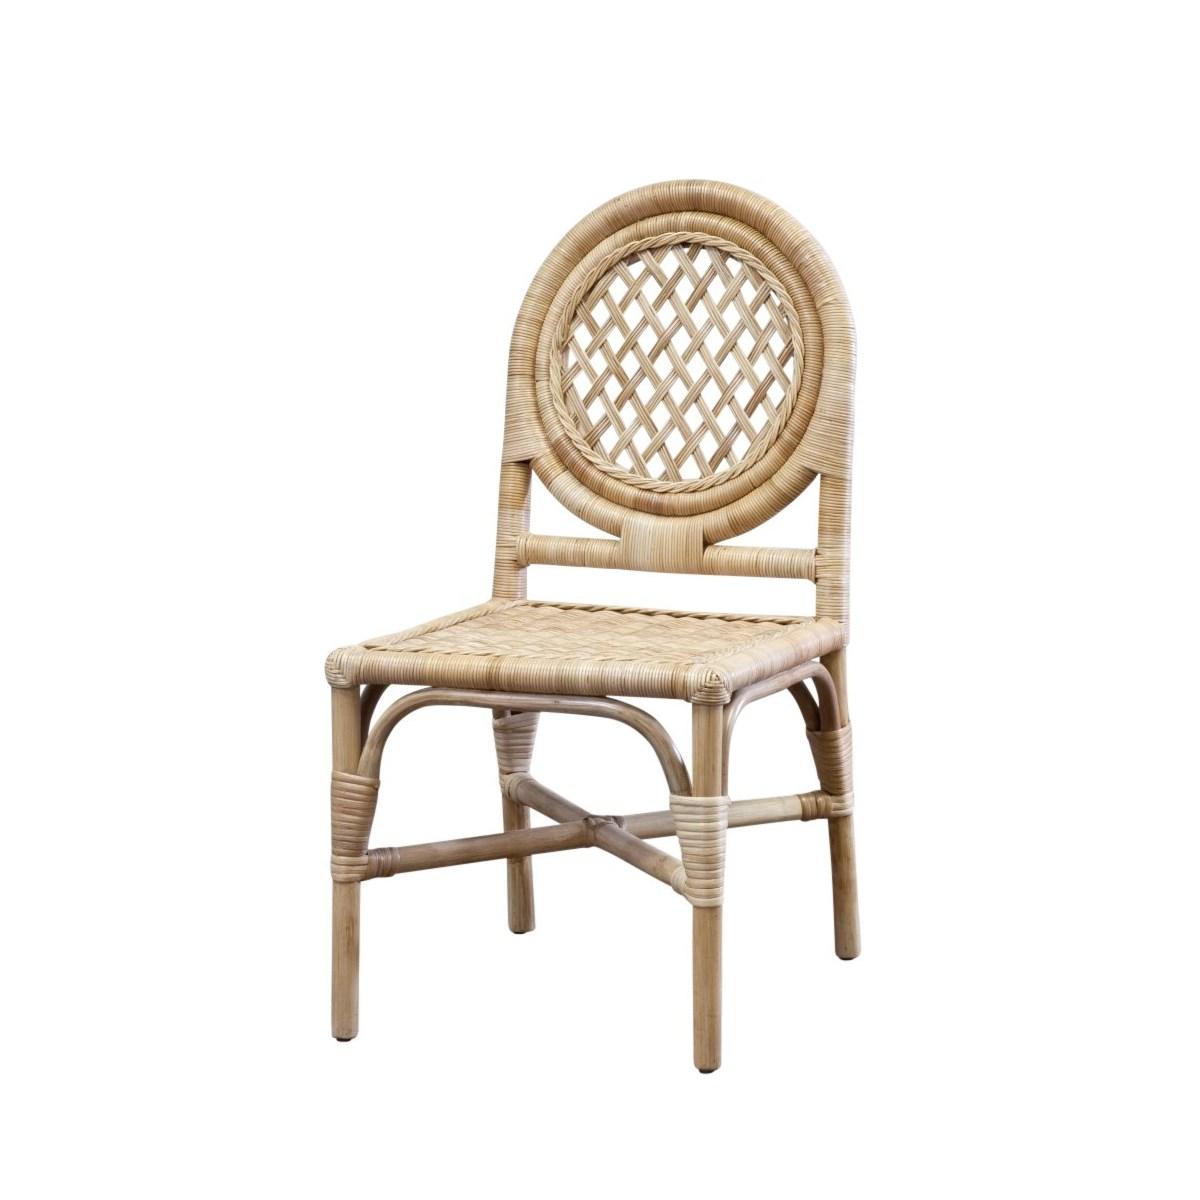 Louis XVI Trellis Chair